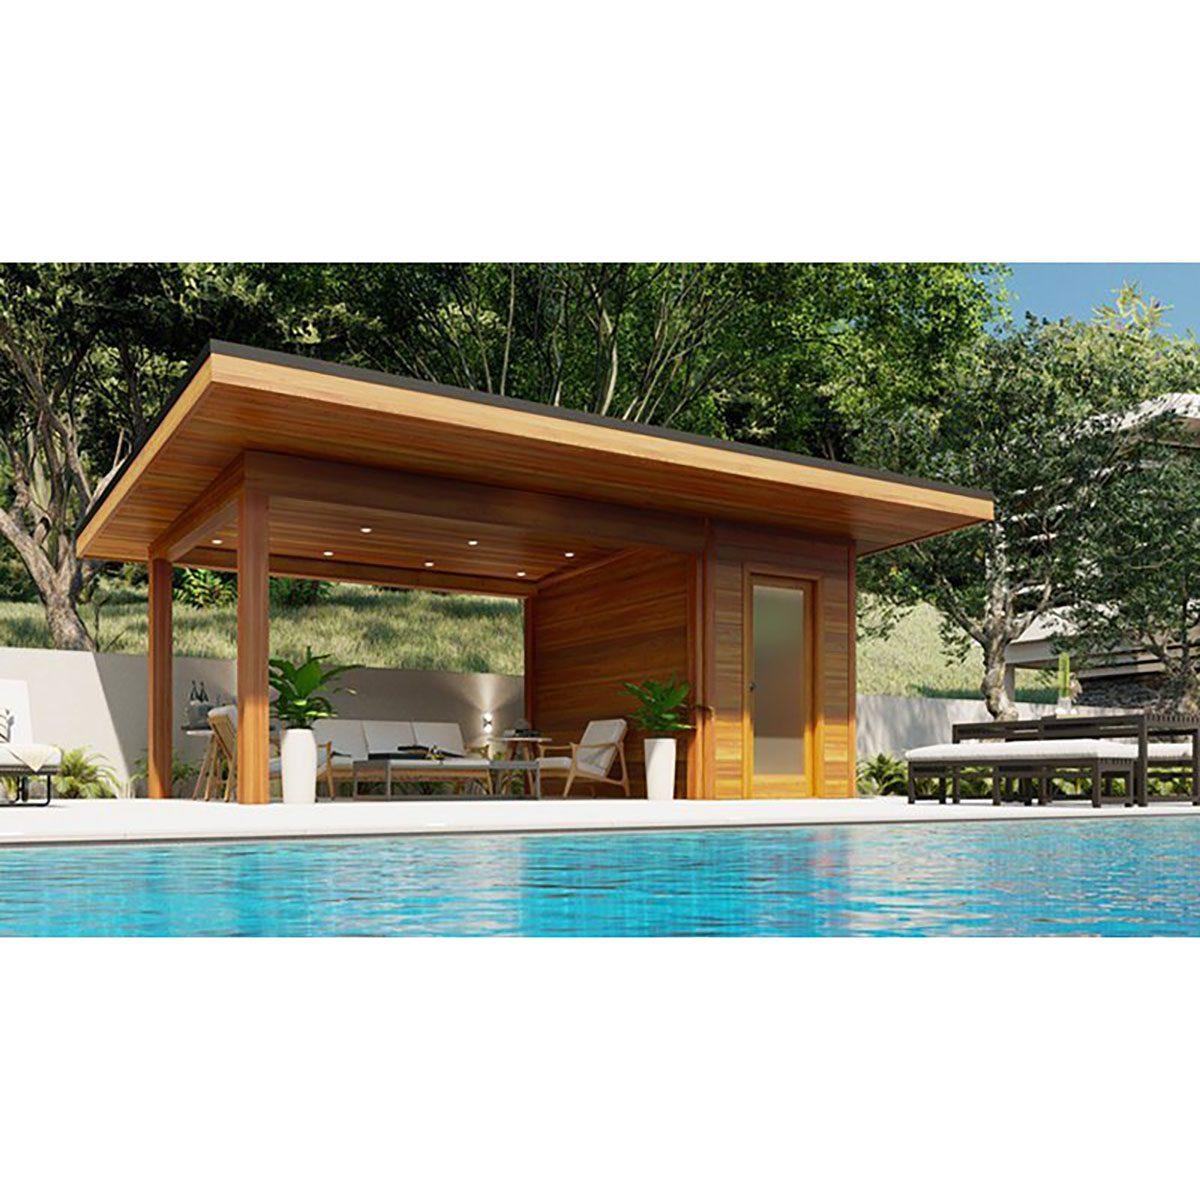 Pool Cabana Sanara Style Pool Cabana Beauty Shot Slider 01